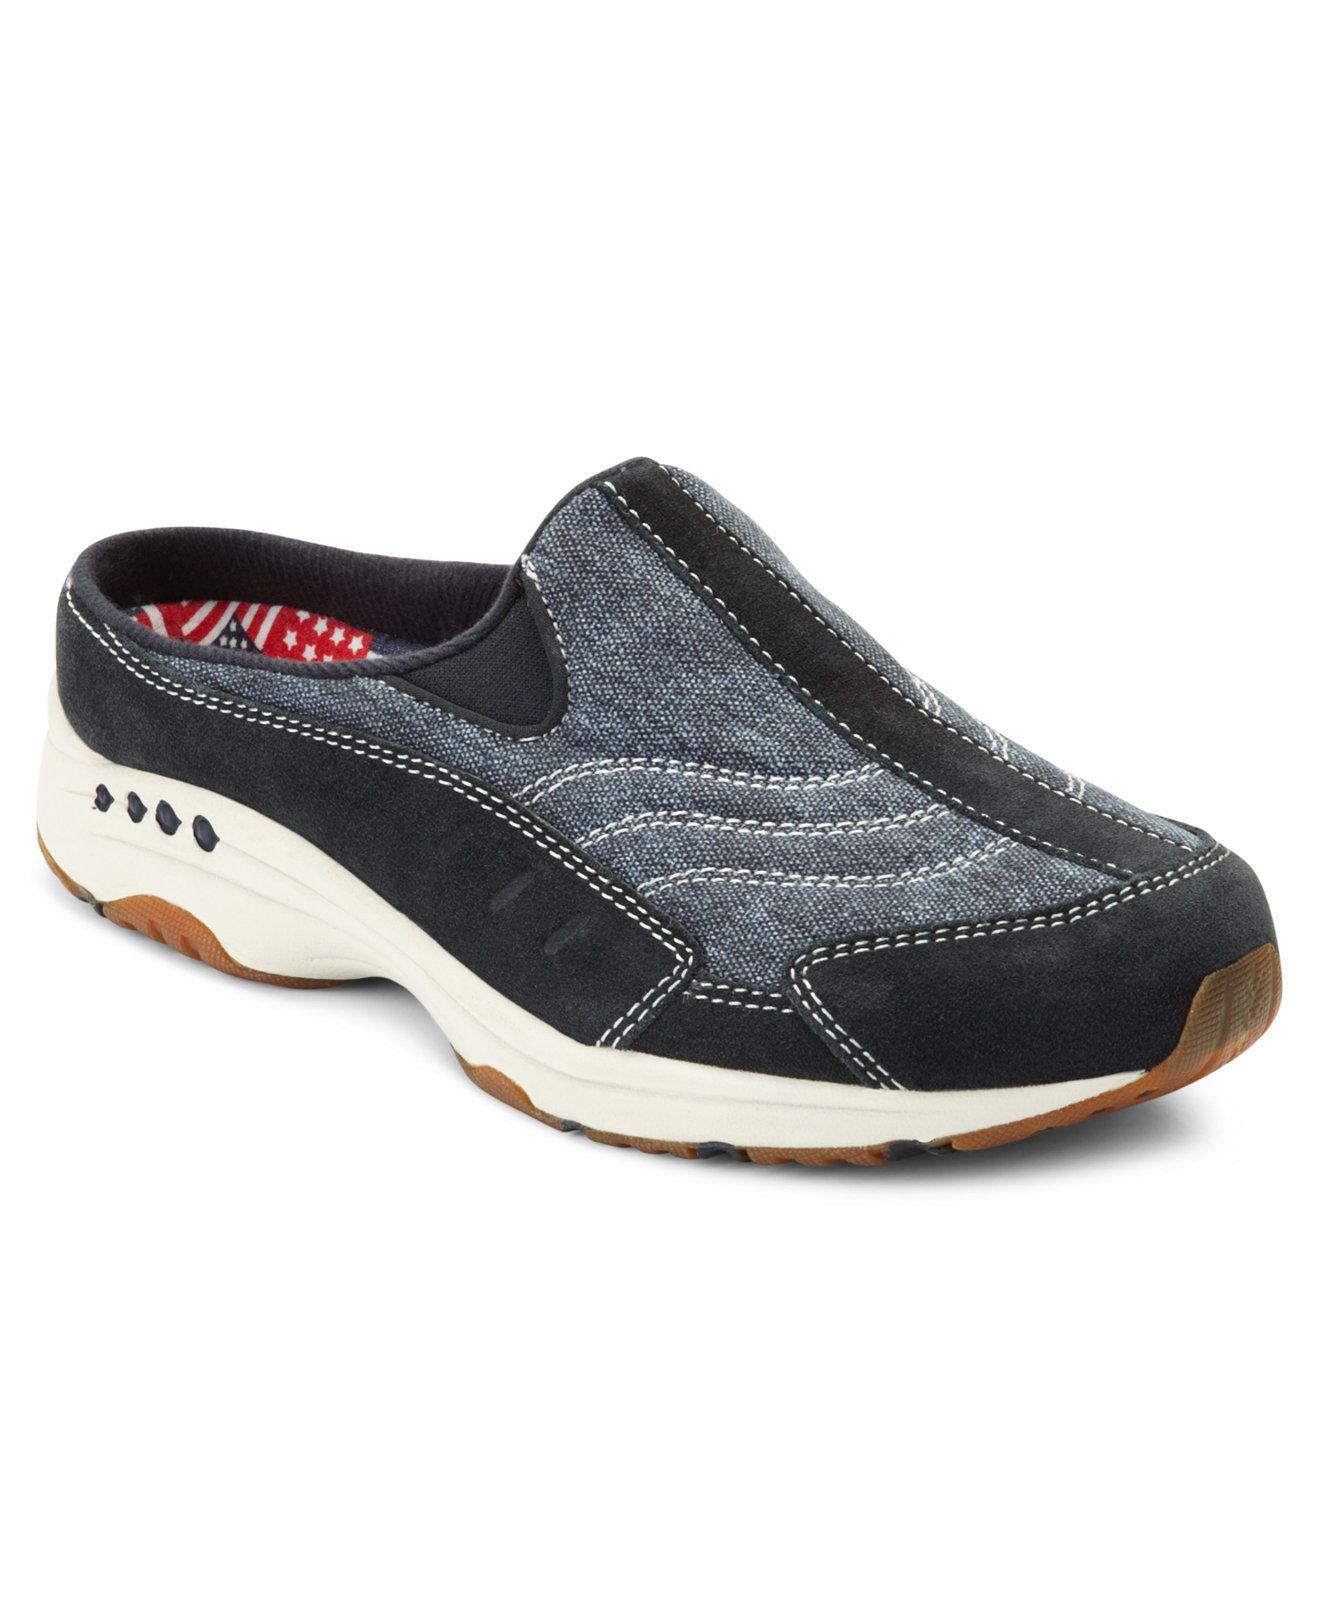 Sneakers - Sale \u0026 Clearance - Shoes